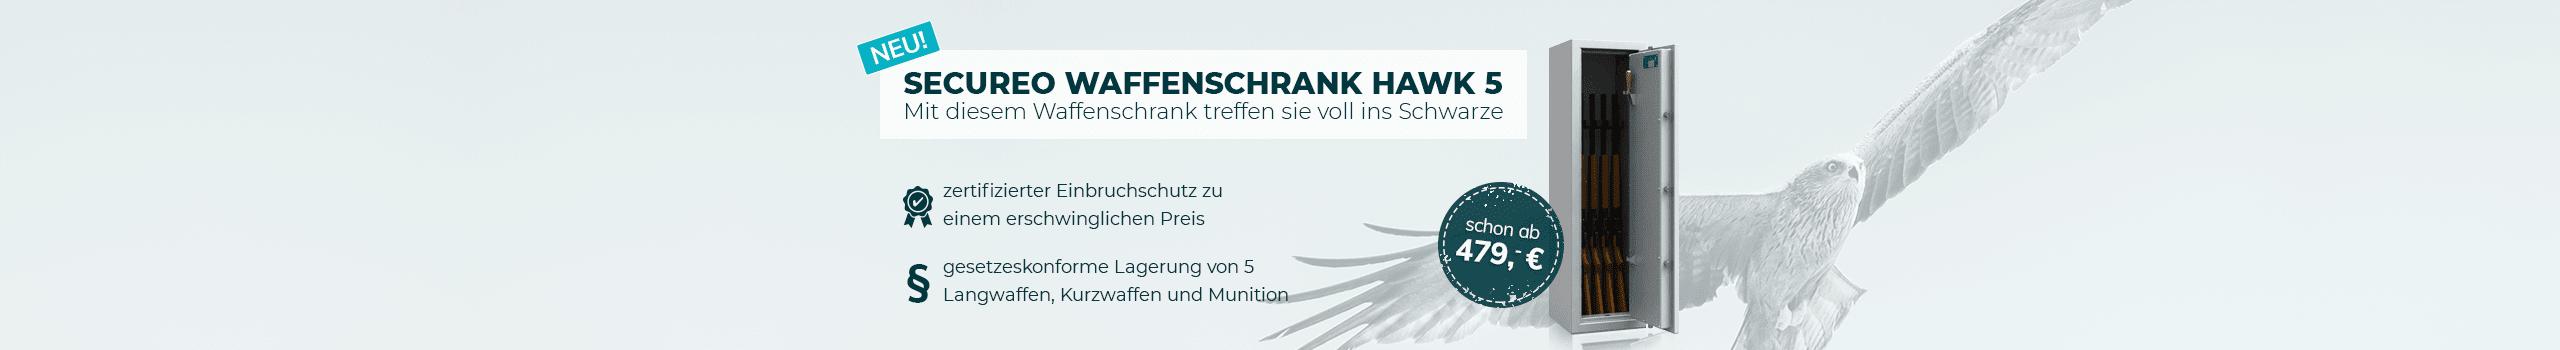 Waffenschrank Hawk 5